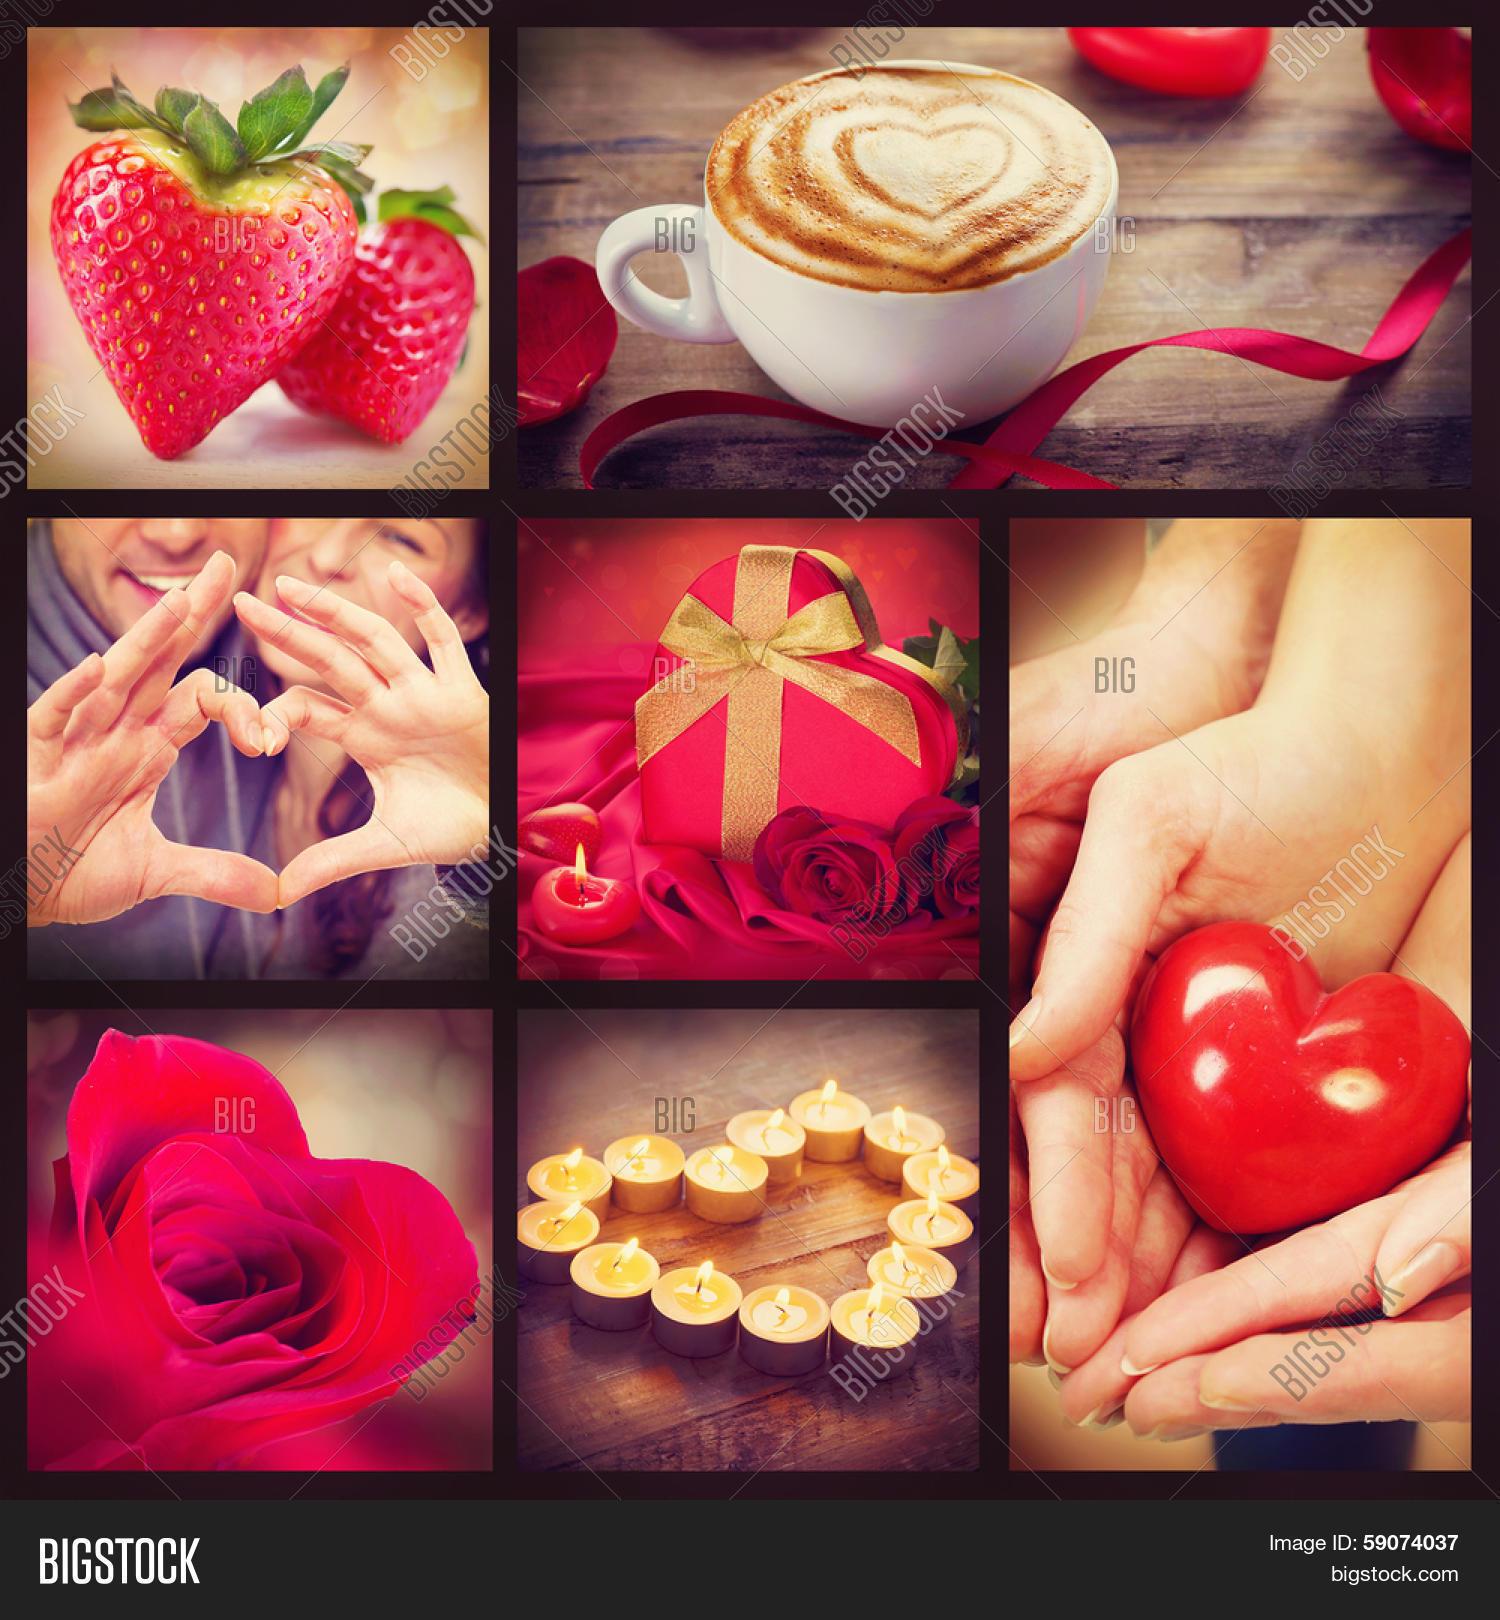 Valentine Collage  Image & Photo (Free Trial) | Bigstock